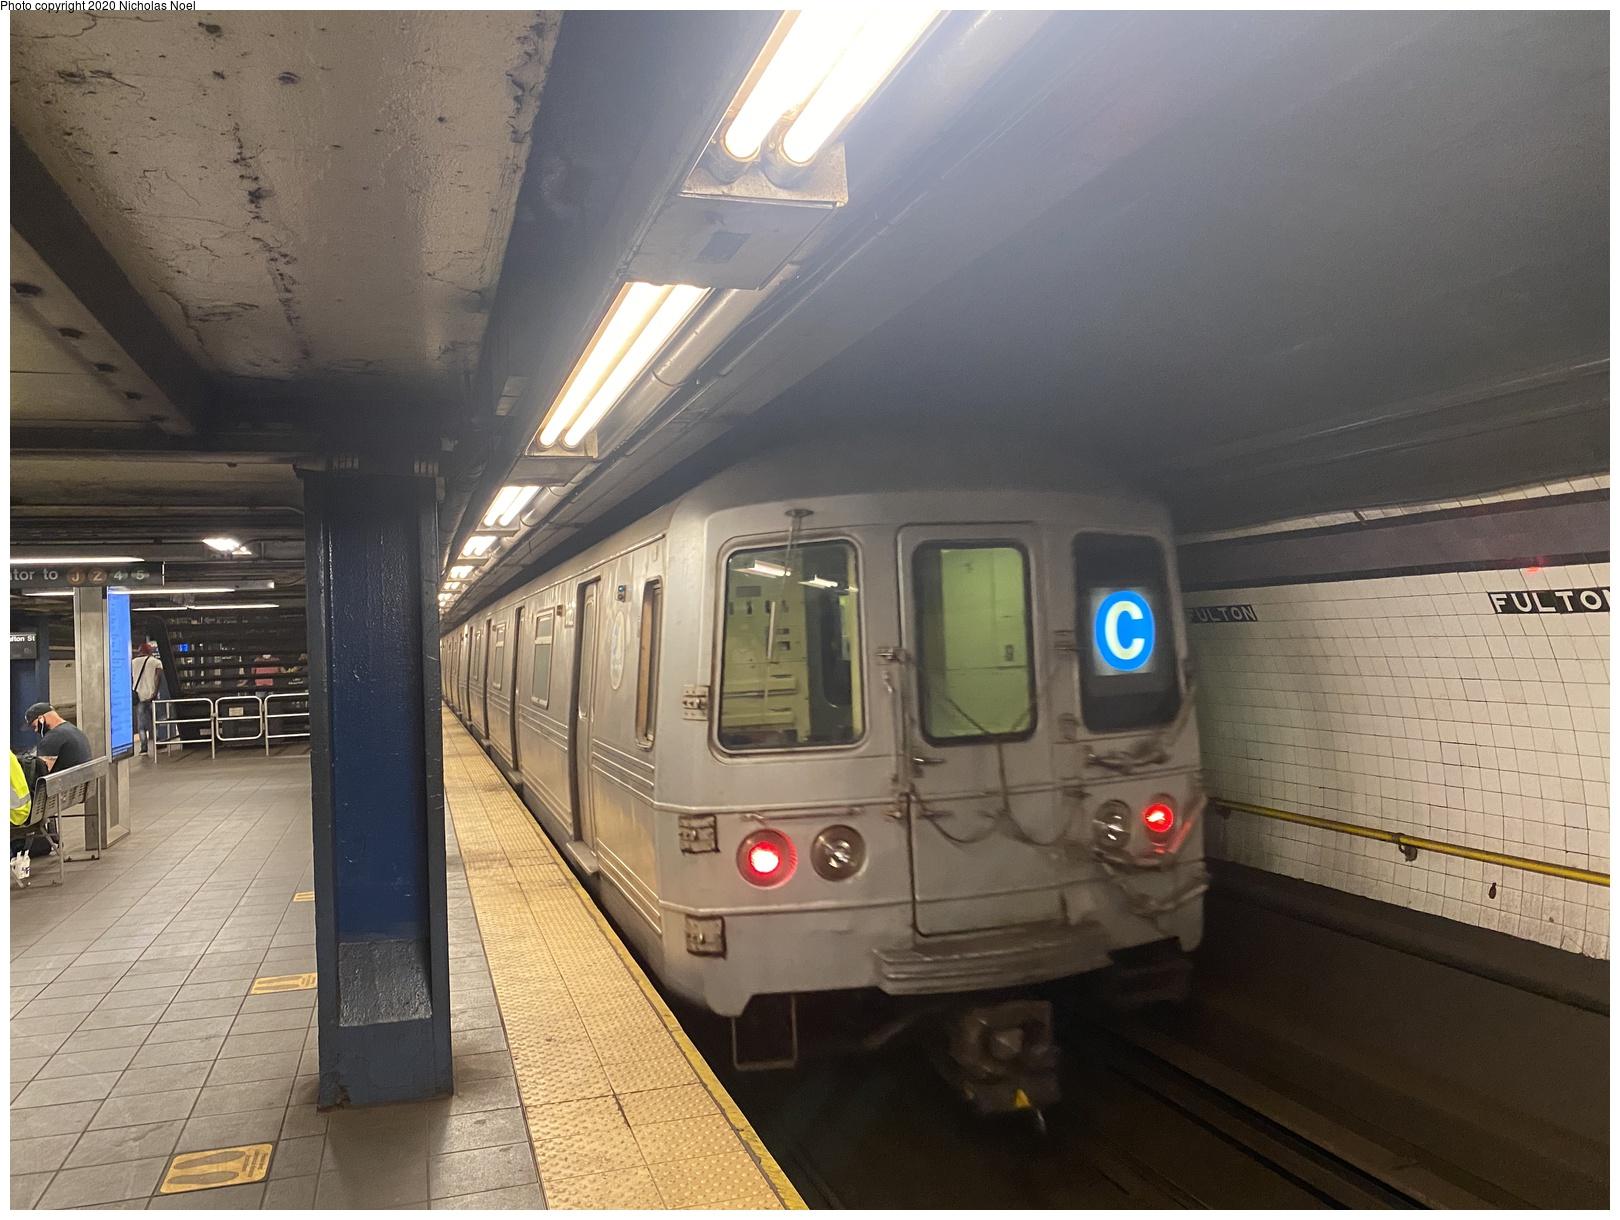 (267k, 1044x816)<br><b>Country:</b> United States<br><b>City:</b> New York<br><b>System:</b> New York City Transit<br><b>Line:</b> BMT Fulton<br><b>Location:</b> Rockaway Avenue <br><b>Car:</b> BMT C  <br><b>Photo by:</b> Joel Shanus<br><b>Viewed (this week/total):</b> 1 / 1766